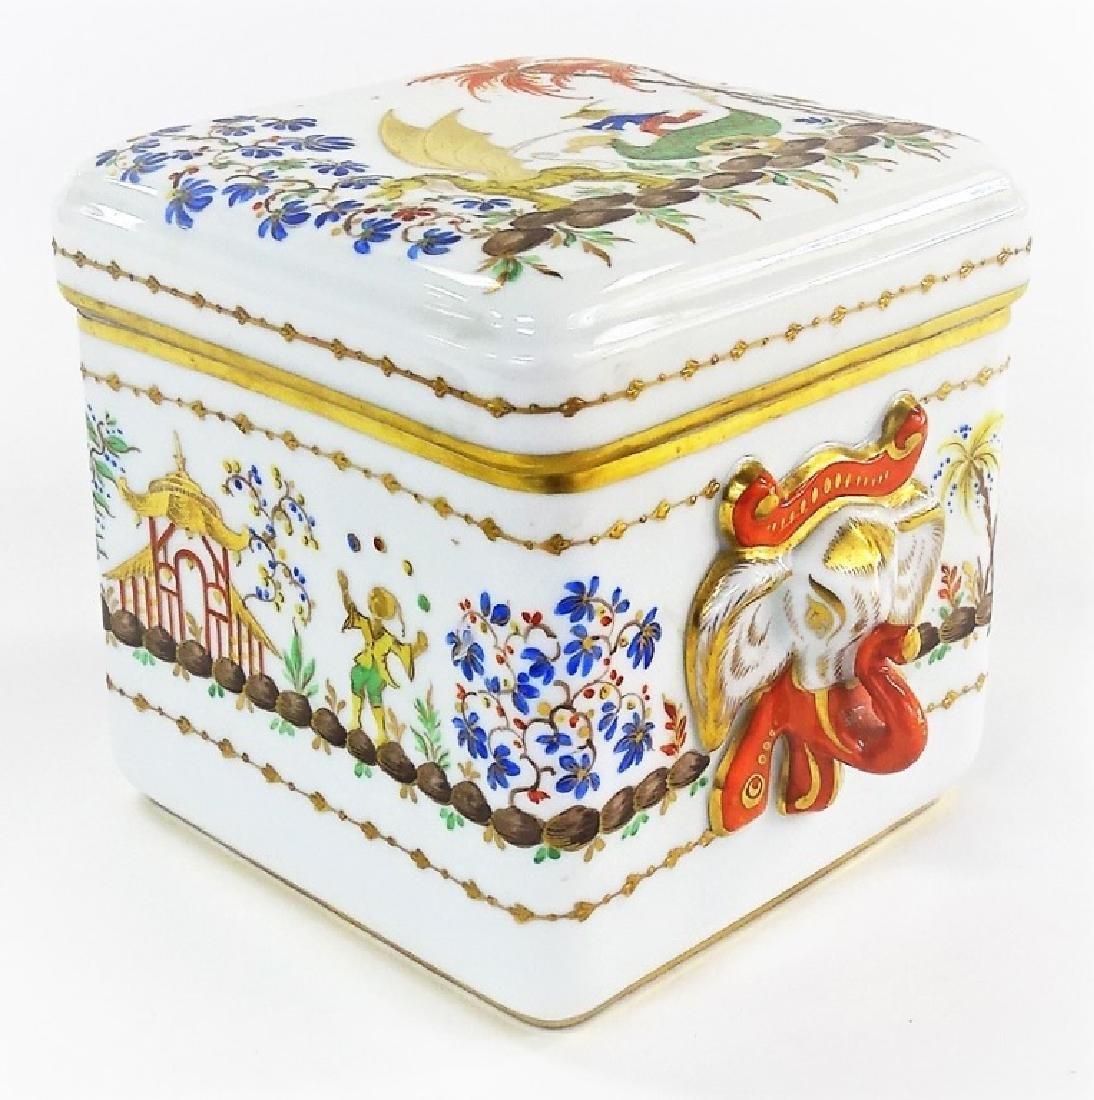 TIFFANY SEVRES STYLE ORIENTALIST PORCELAIN BOX